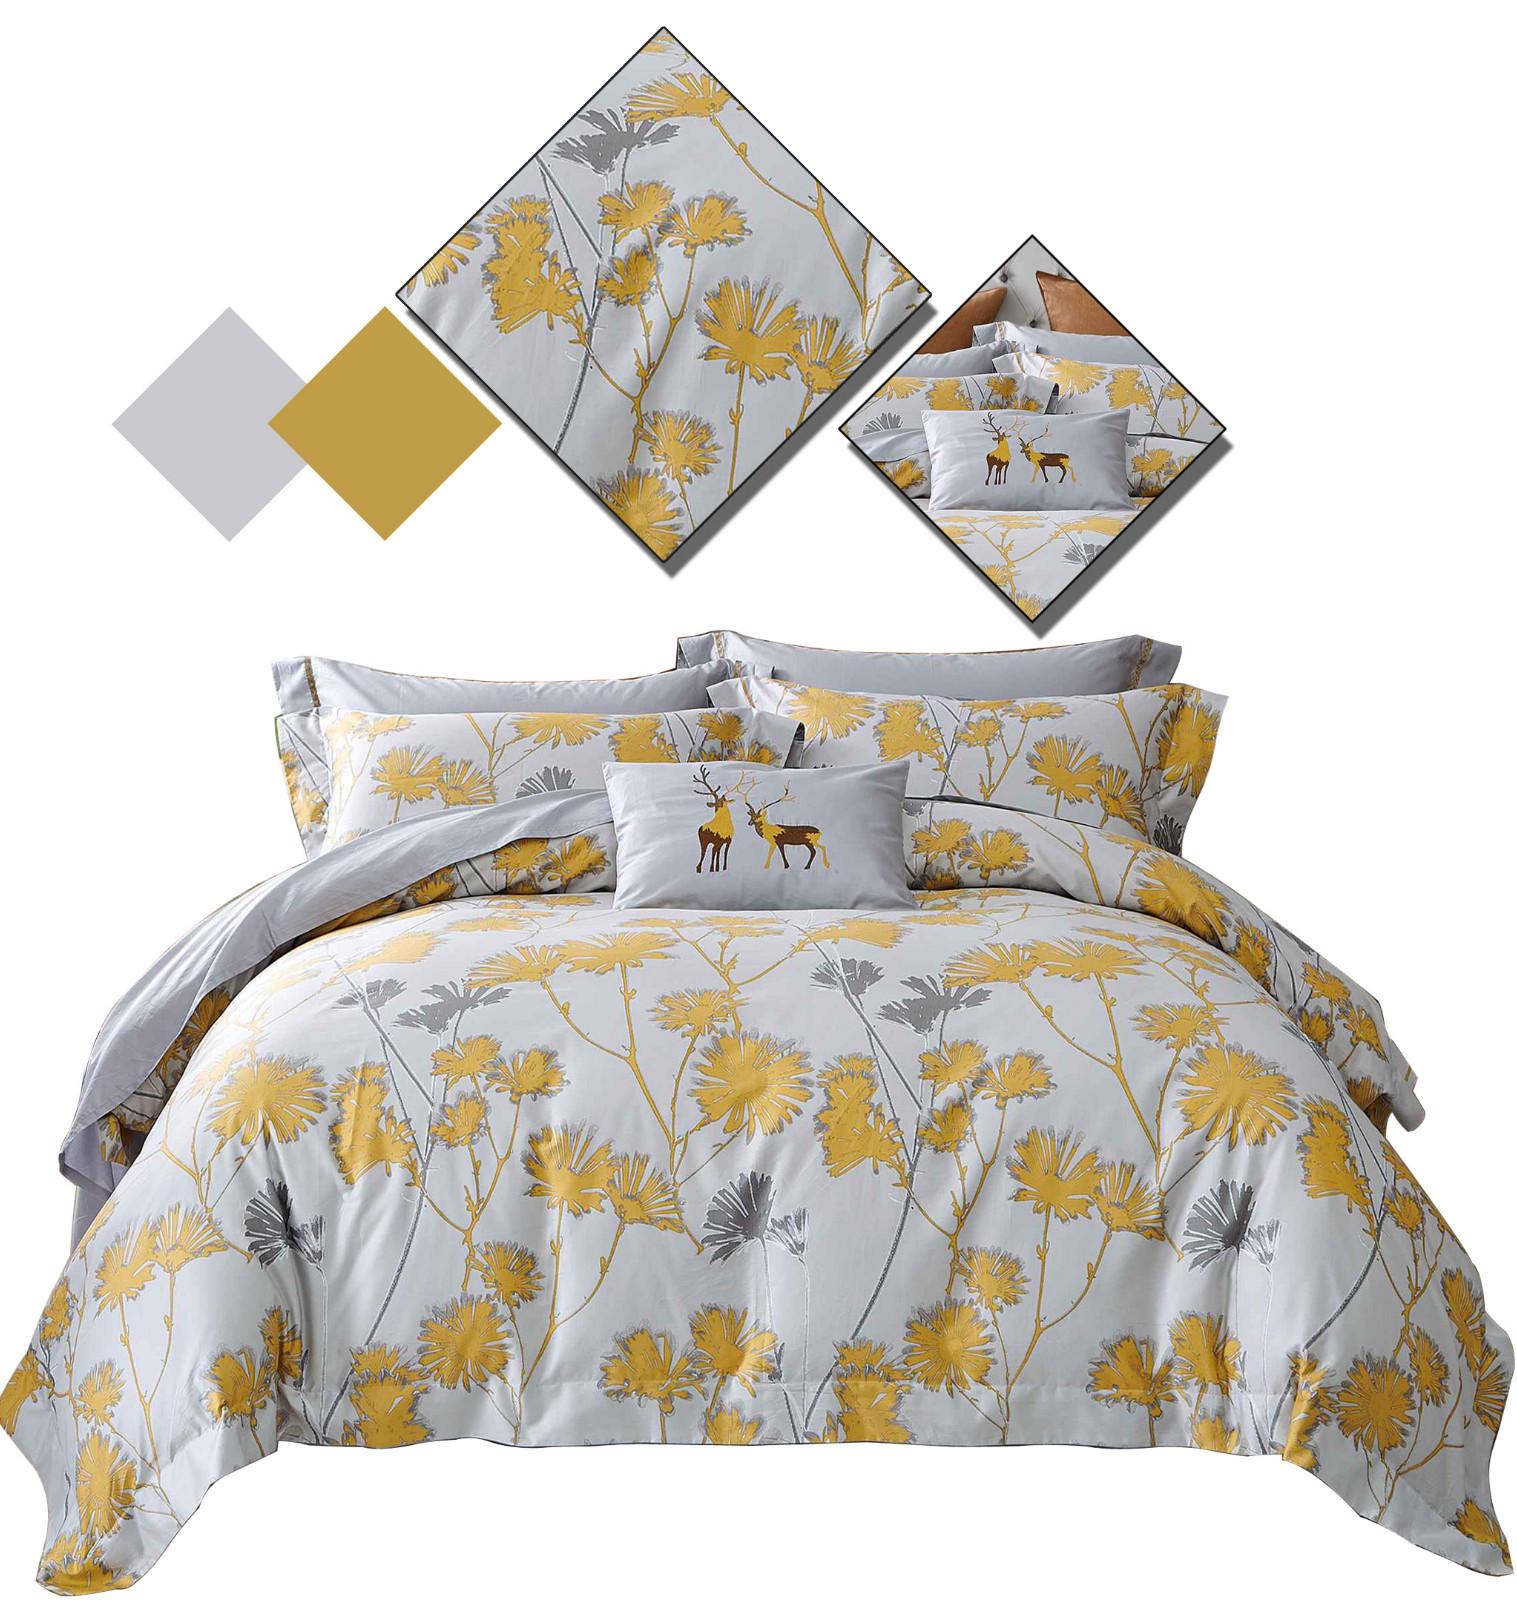 printed designed patterns 100 cotton bedding sets Daphne manufacture